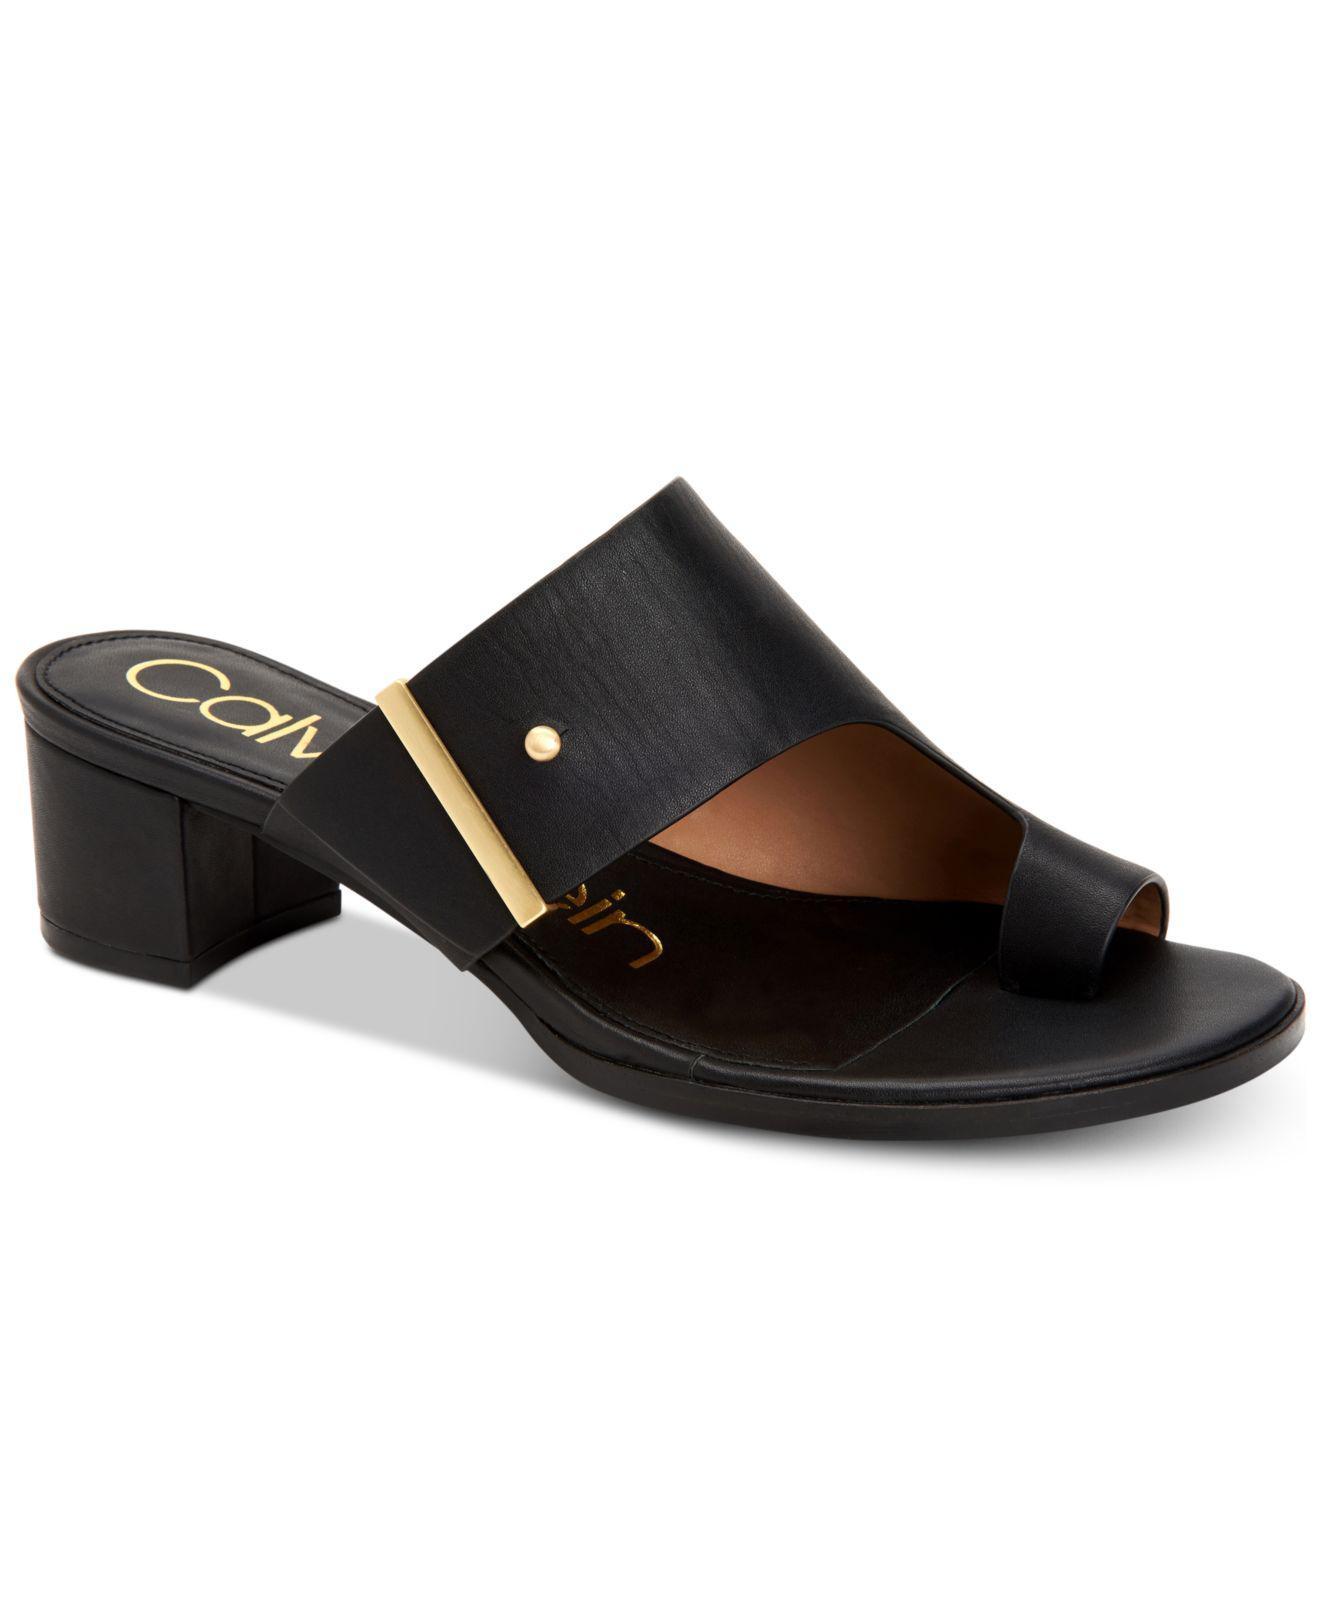 012cf1baa3 Calvin Klein Daria Dress Sandals, Created For Macy's in Black - Lyst